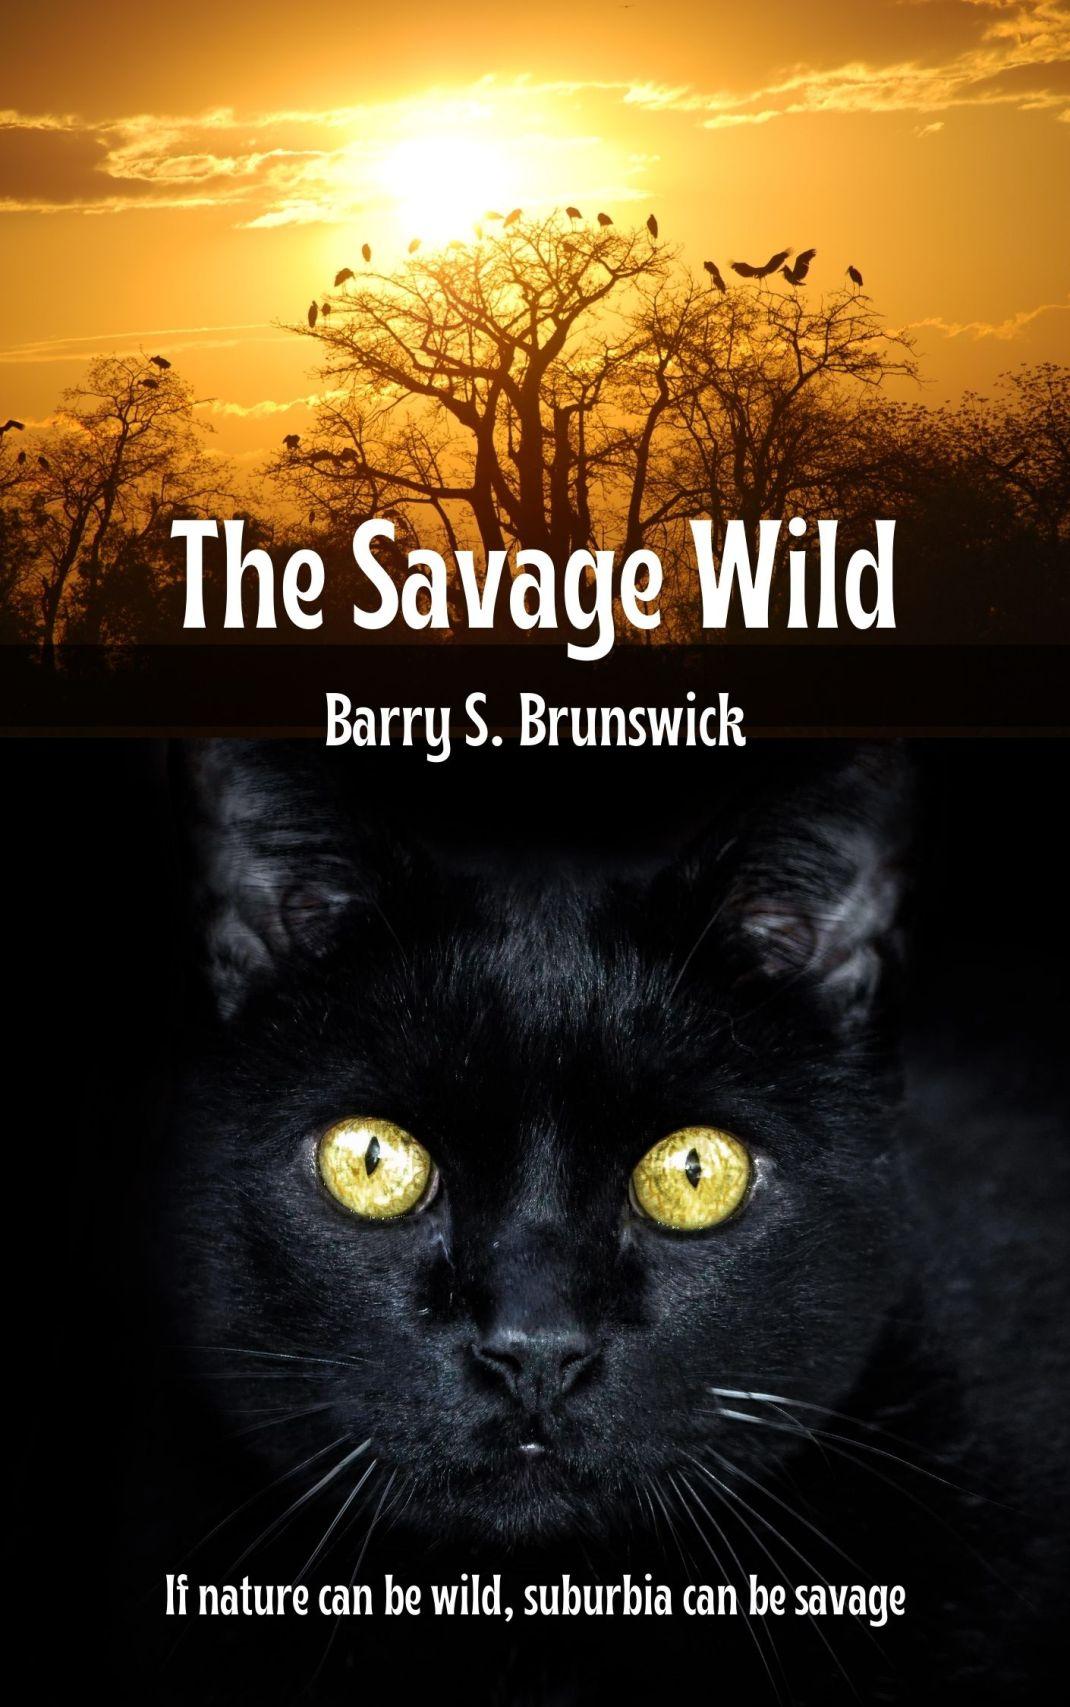 Barry-S-Brunswick-The-Savage-Wild-Book